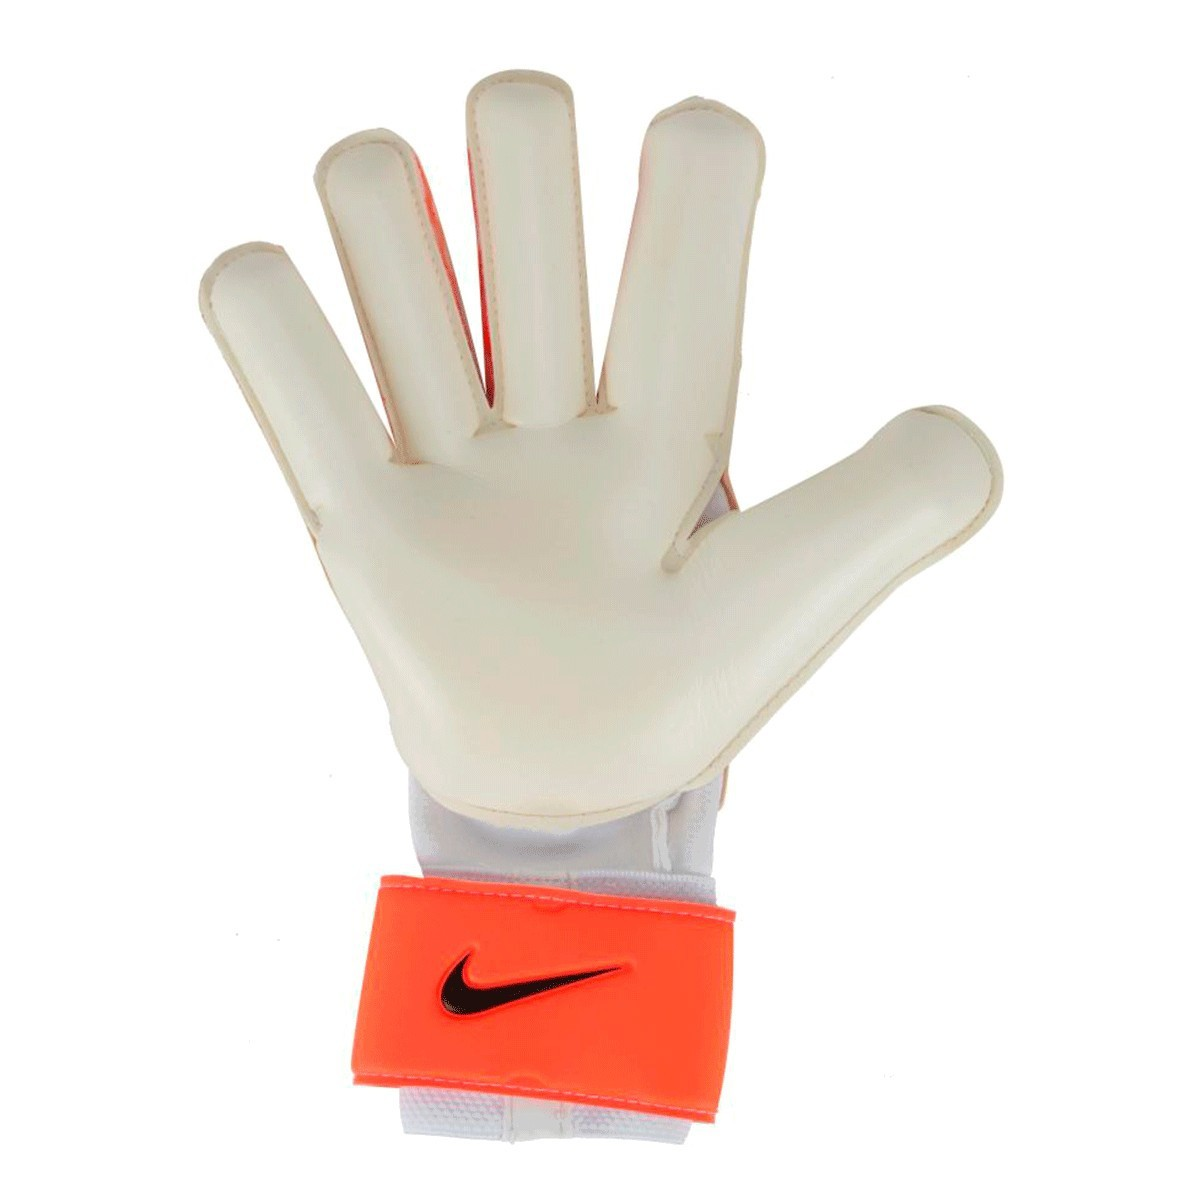 Luvas de Goleiro Nike Grip3 Adulto Branco Laranja